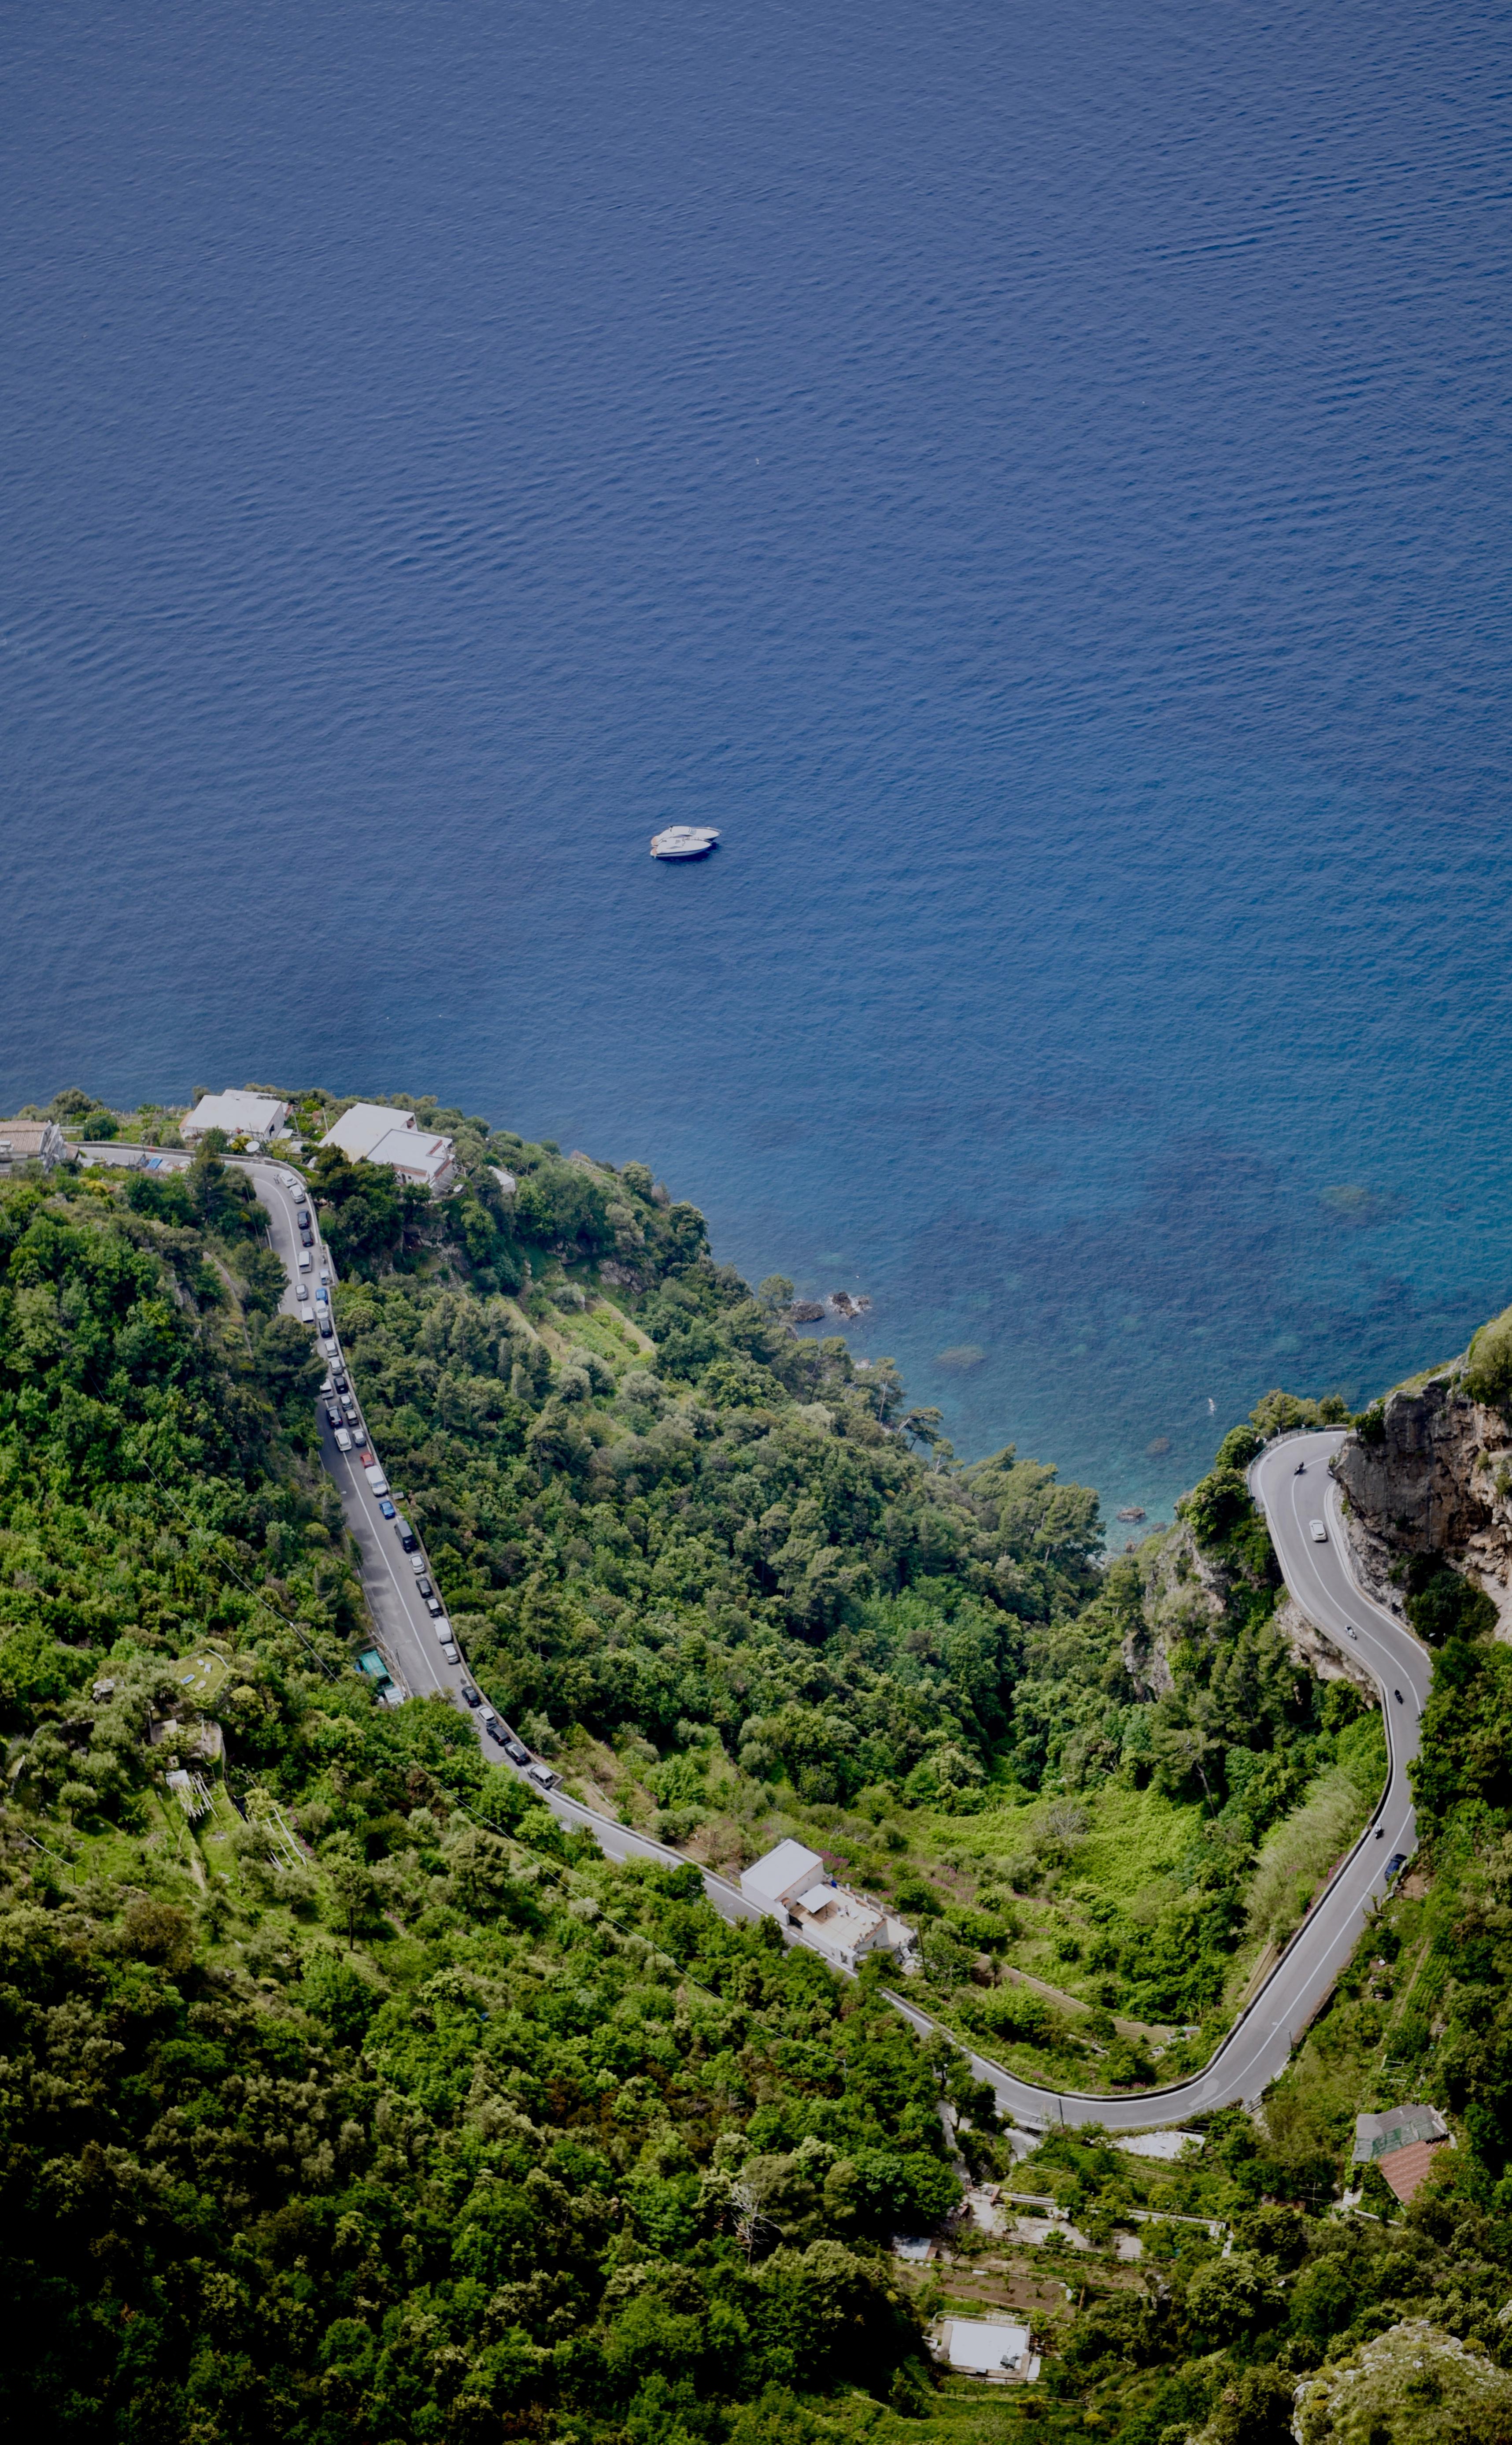 Sentiero Degli Dei Hike Amalfi Coast Drive Road DNXB dongnanxibei